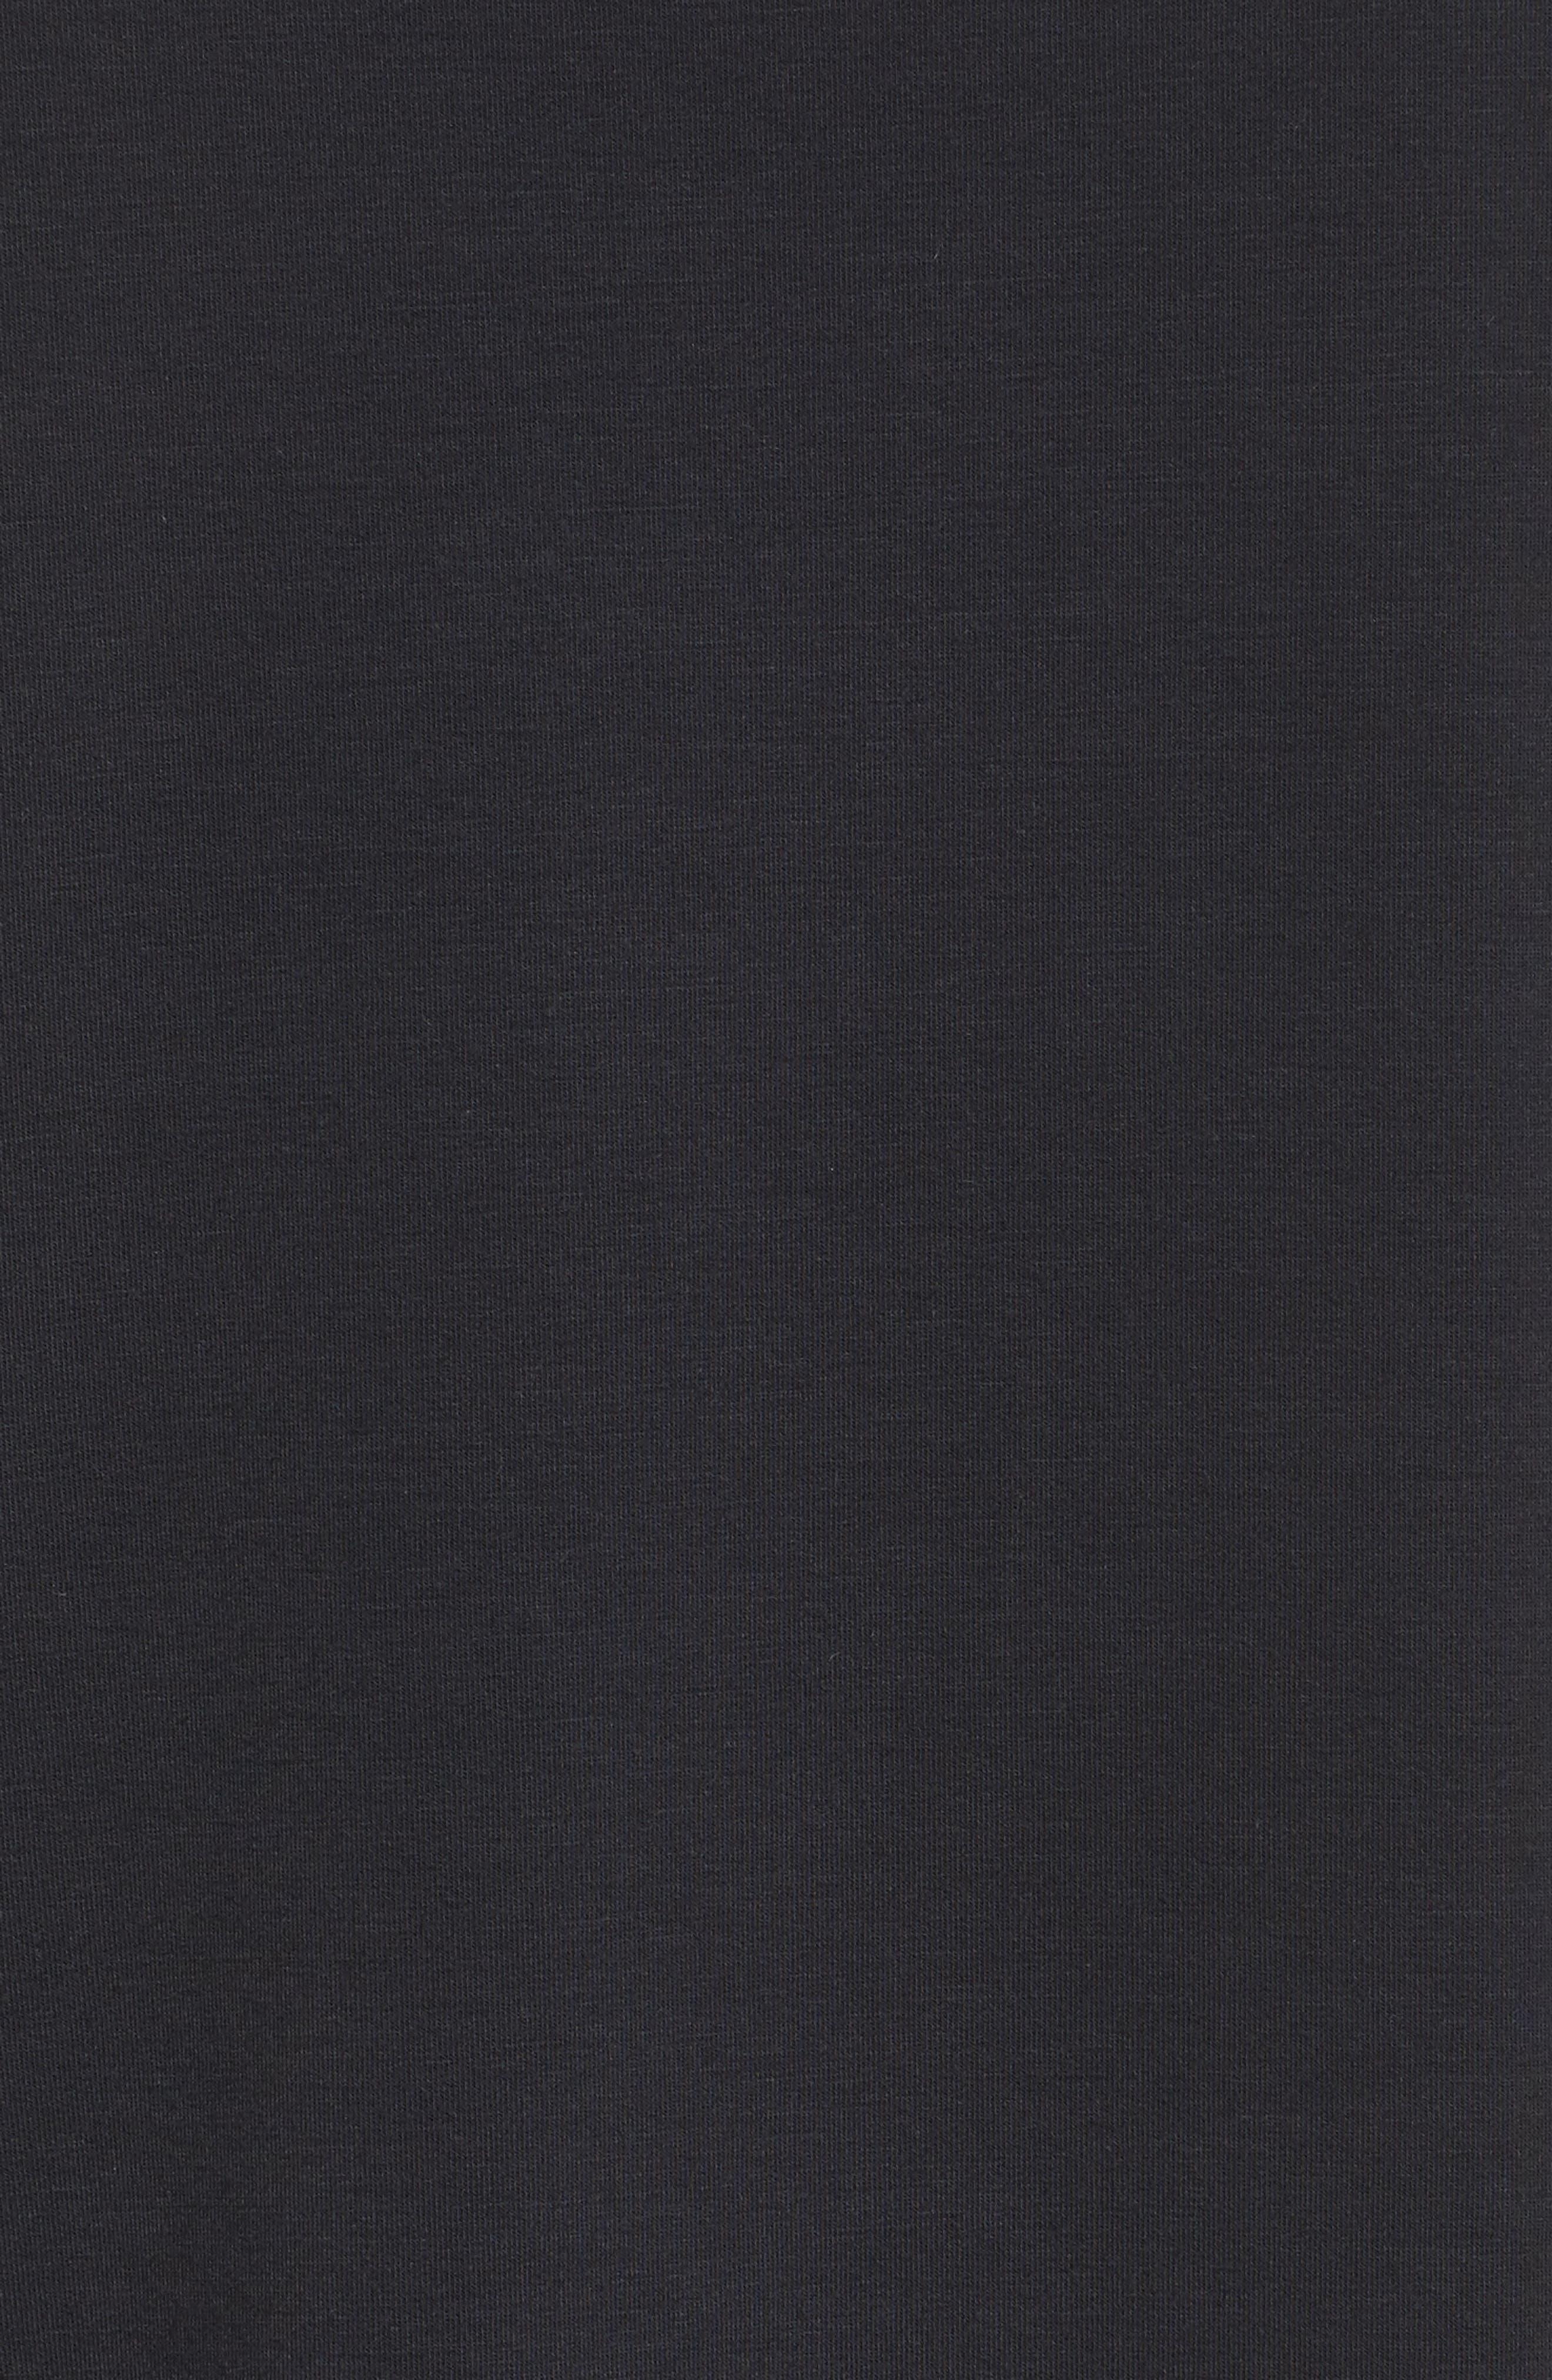 Court Dri-FIT Long Sleeve Tennis Top,                             Alternate thumbnail 6, color,                             Black/ White